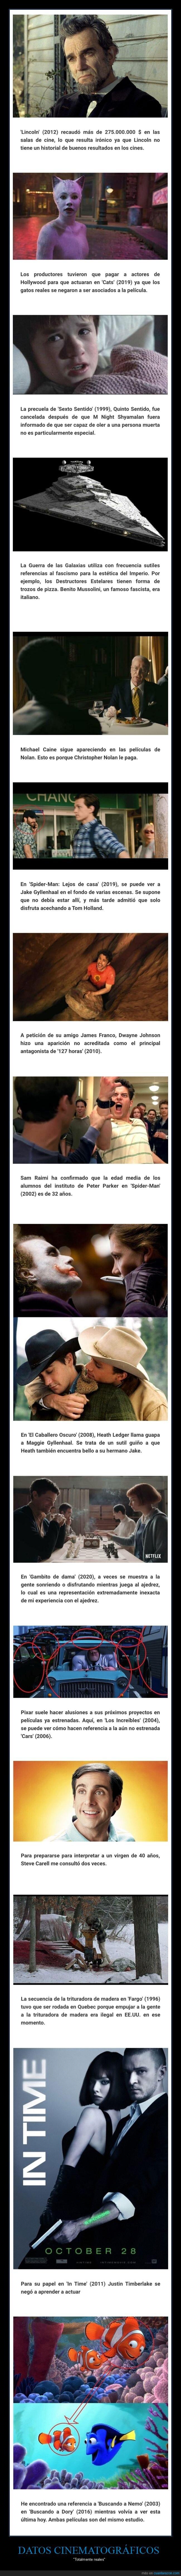 cine,datos